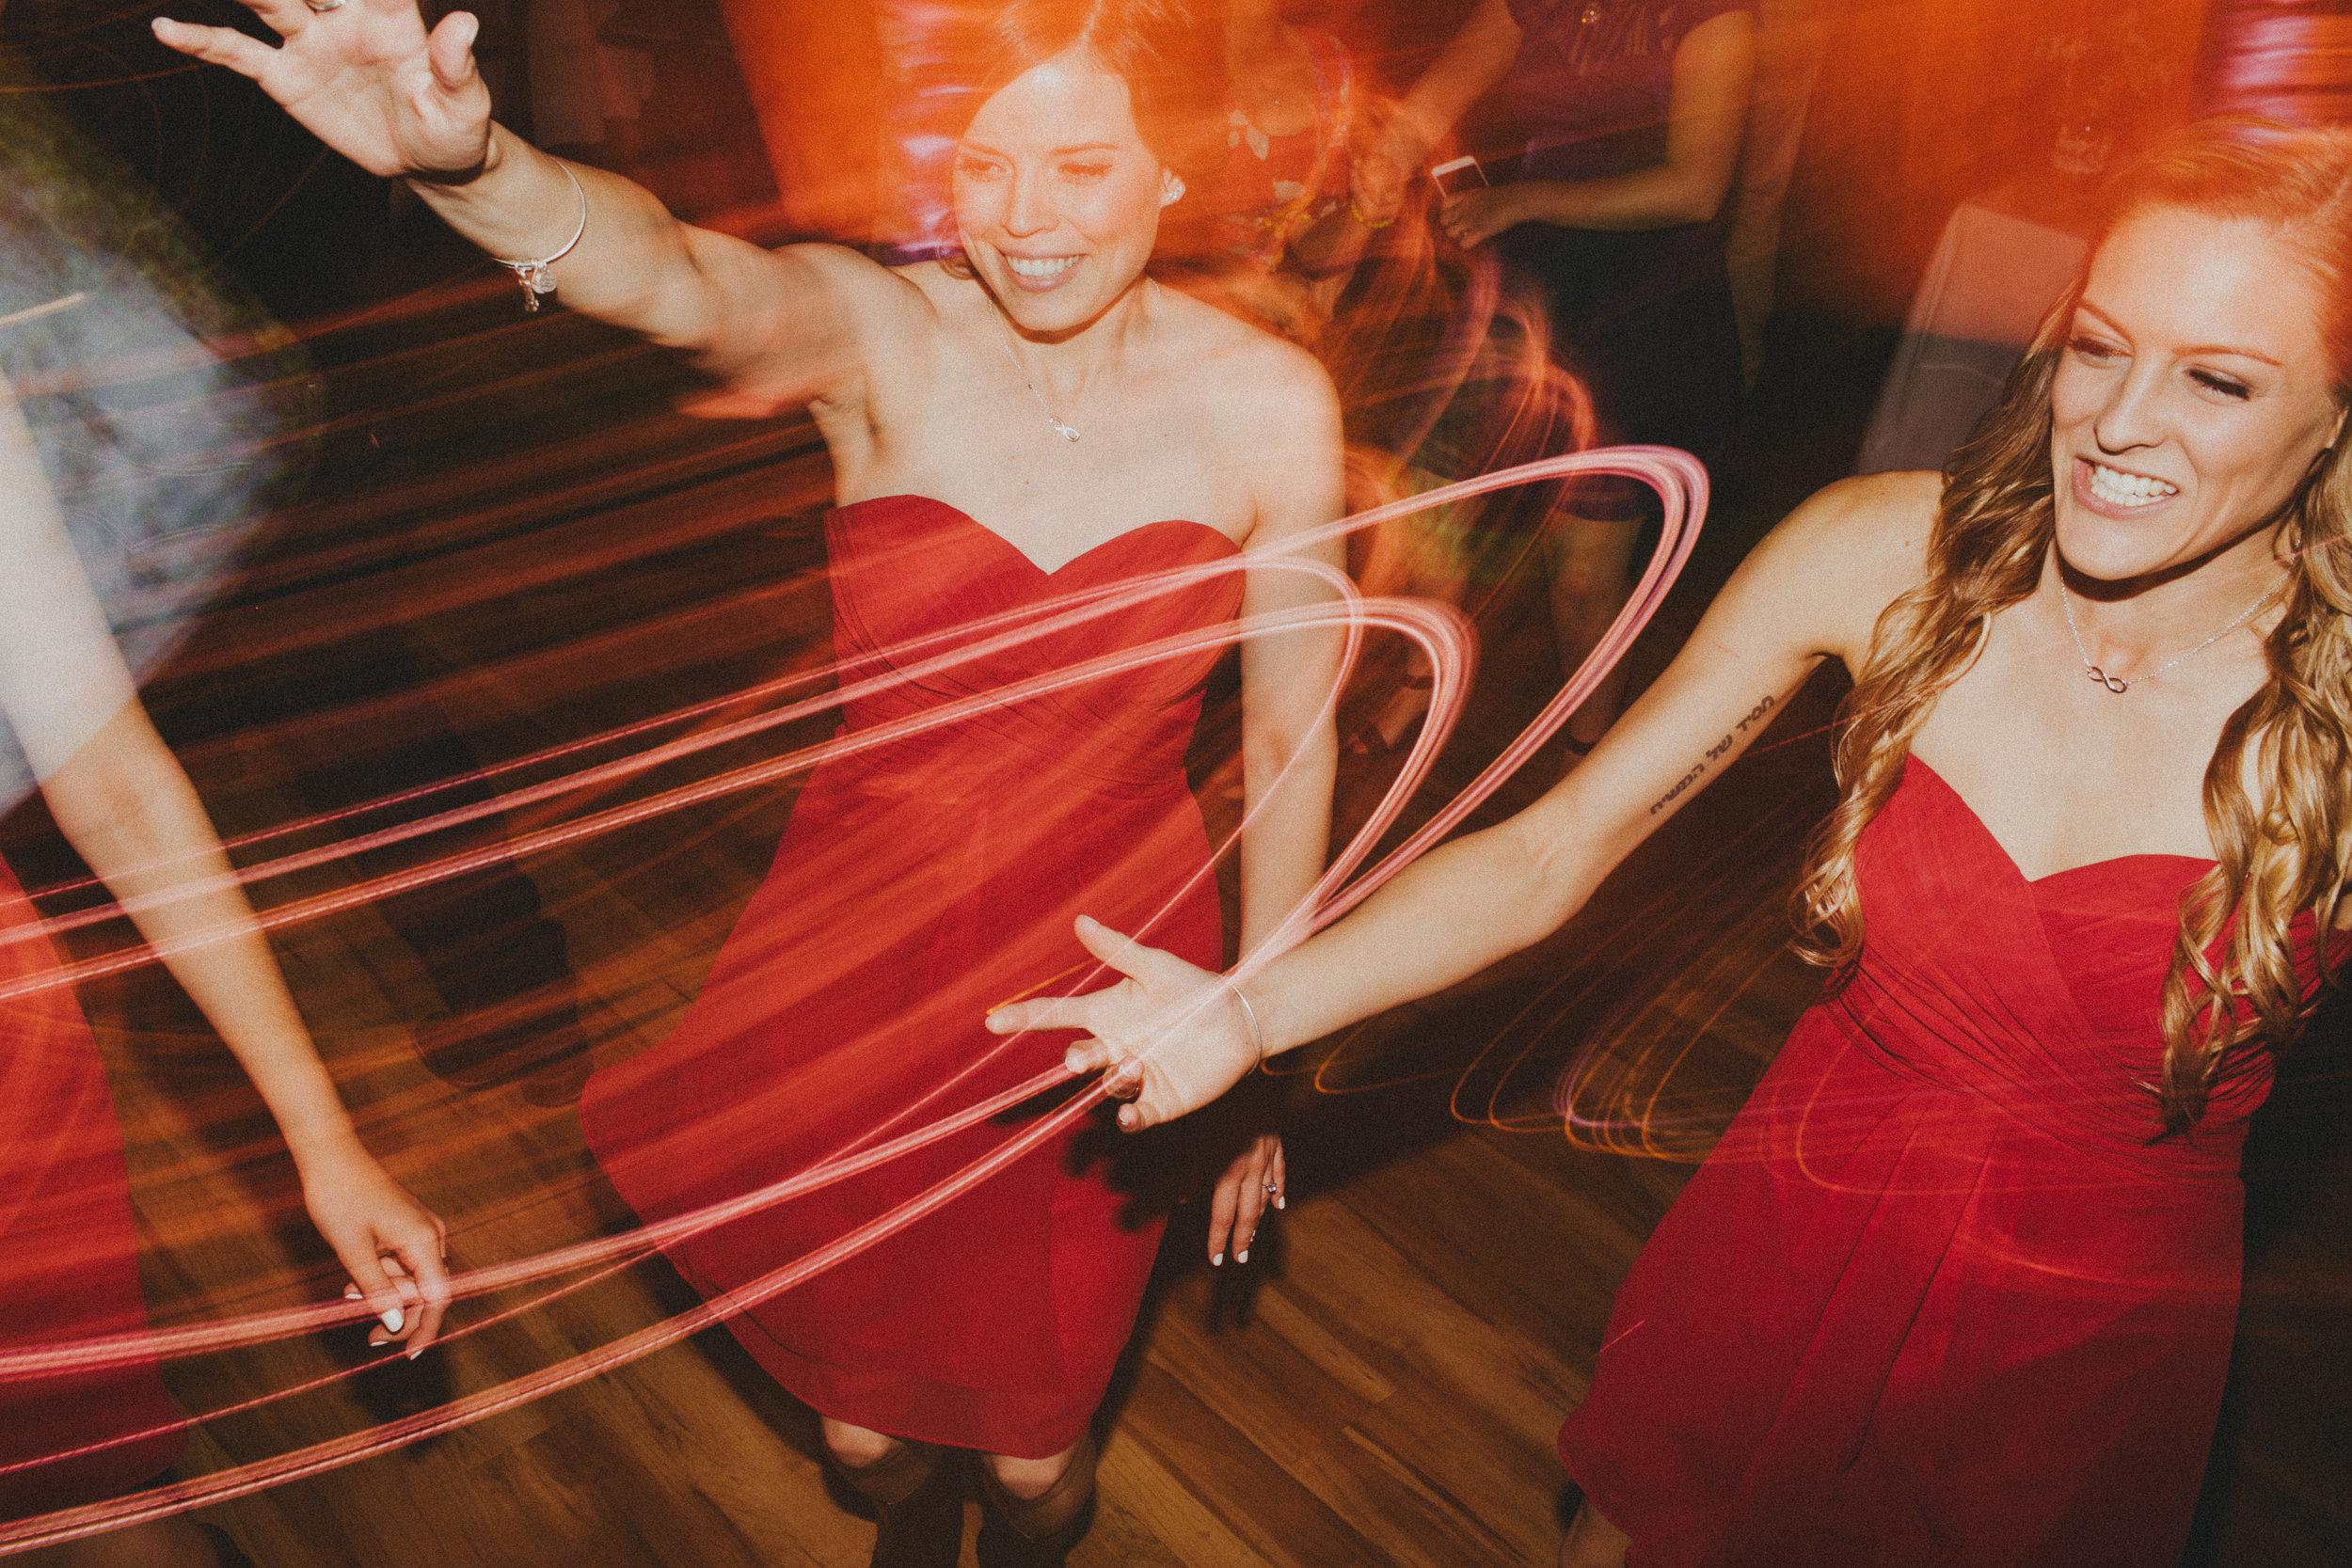 Cheyenne + Jordan - Wedding, Natalie Griffo (144 of 157).jpg